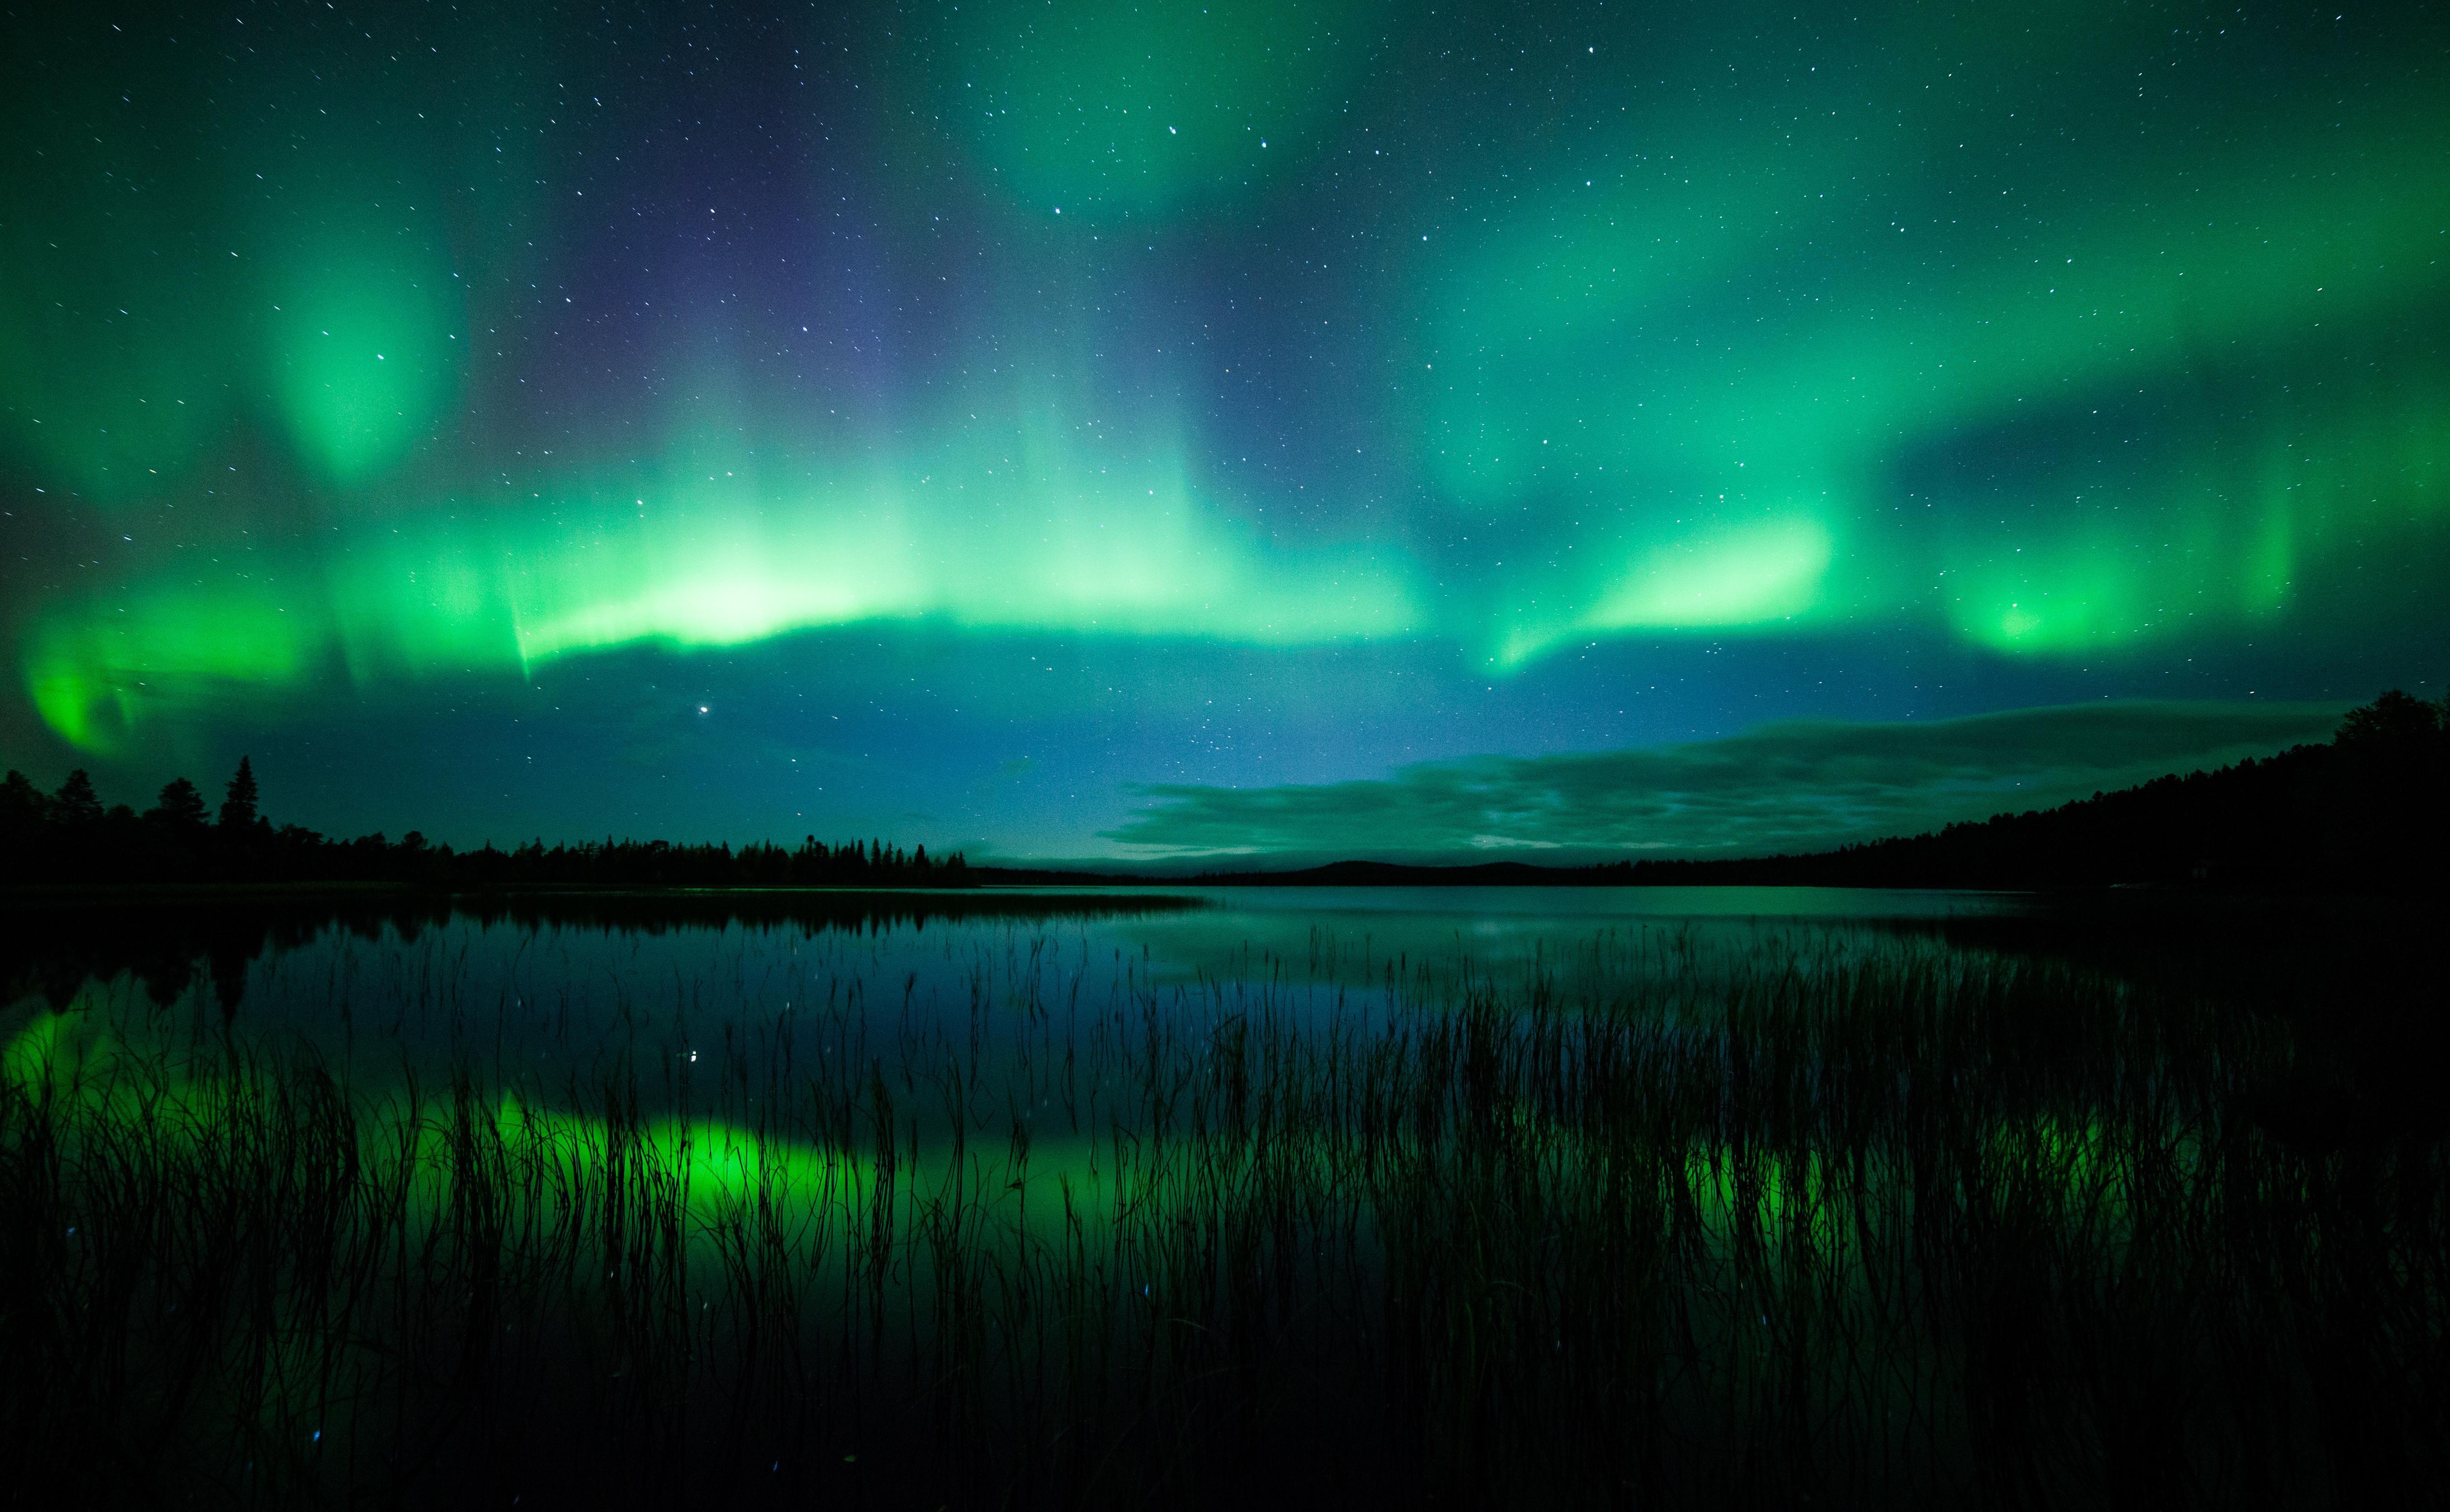 Northern Lights Aurora Borealis Images | TheCelebrityPix